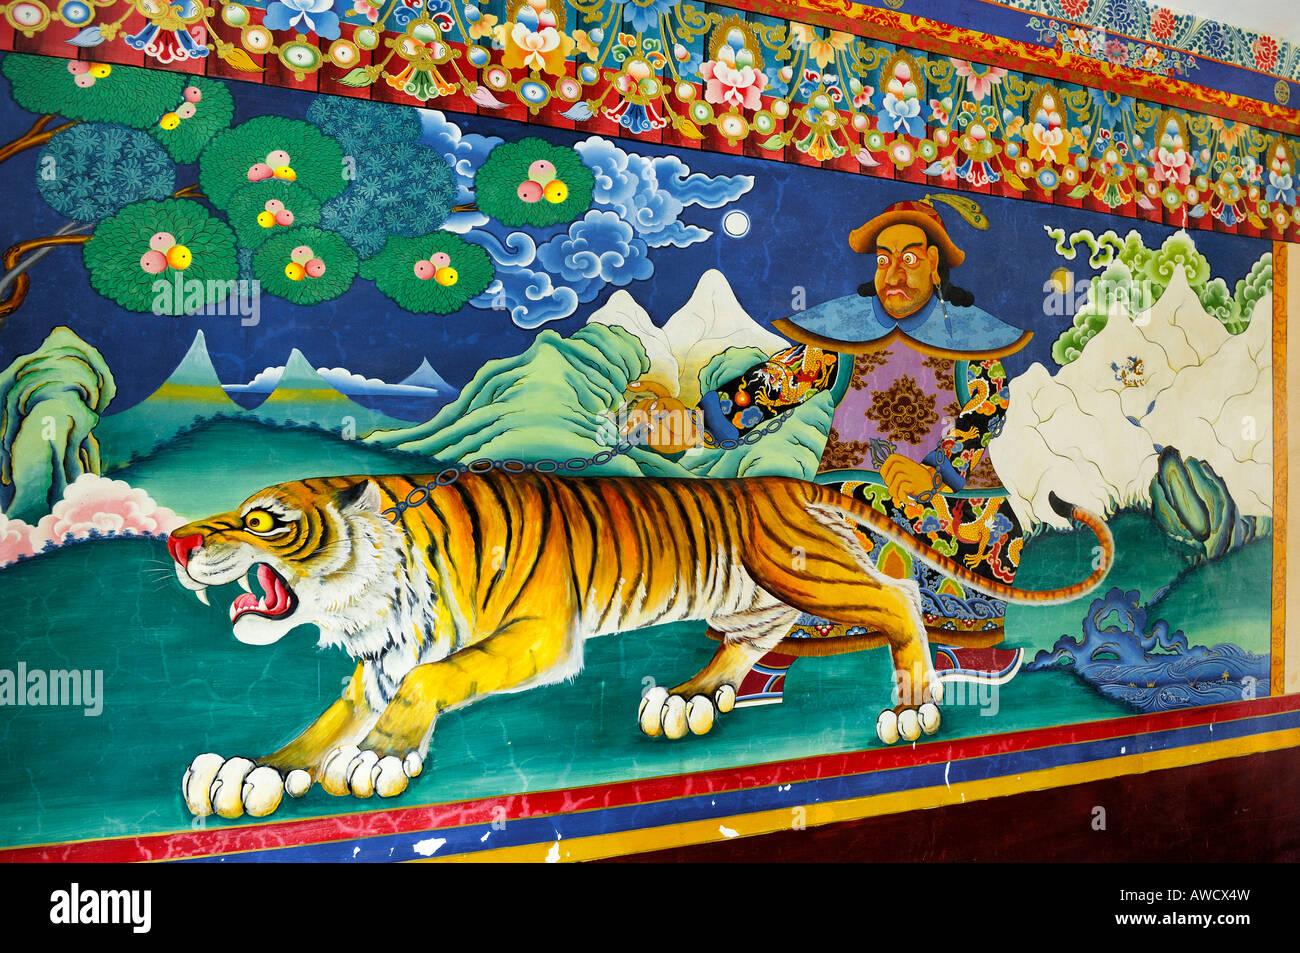 Mural painting, Gyantse, Tibet - Stock Image